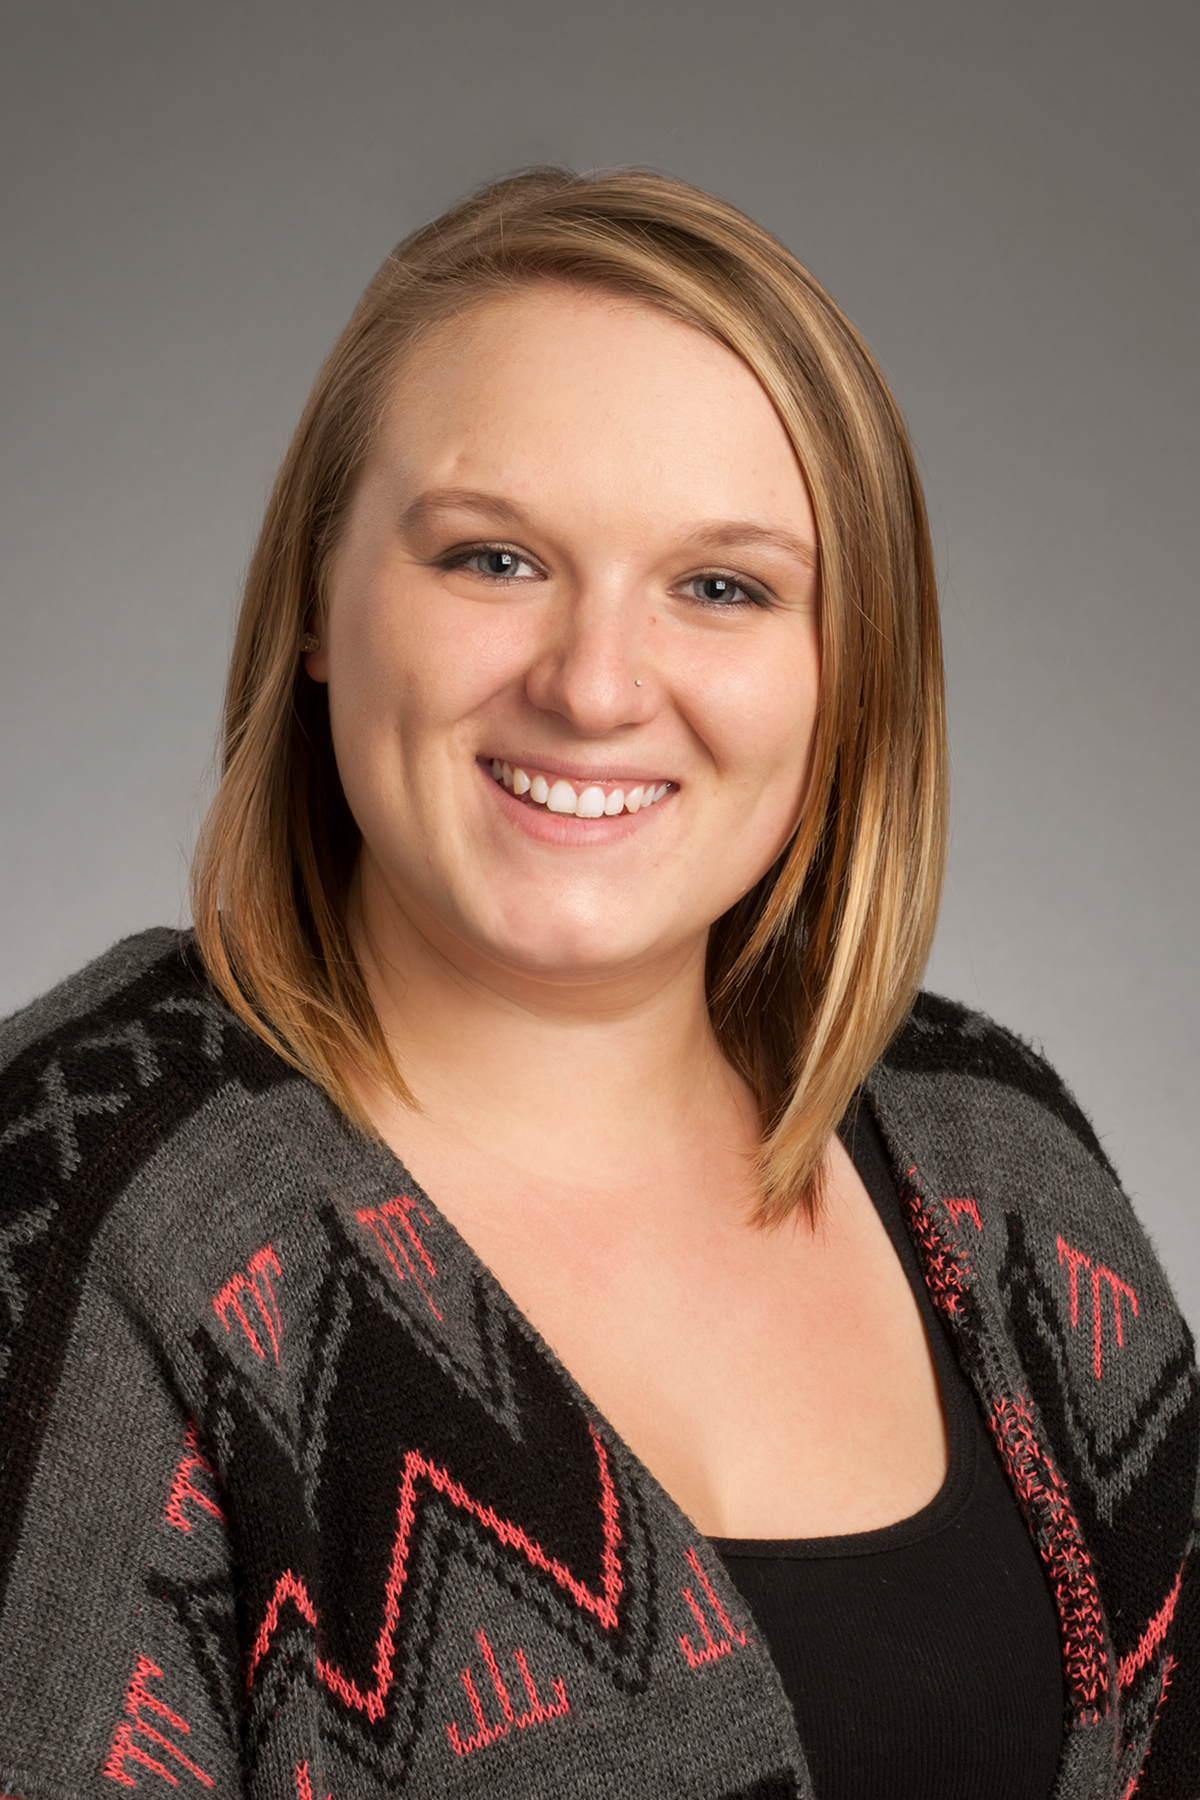 Christy Hill, University Health Services, UHS, studio portrait